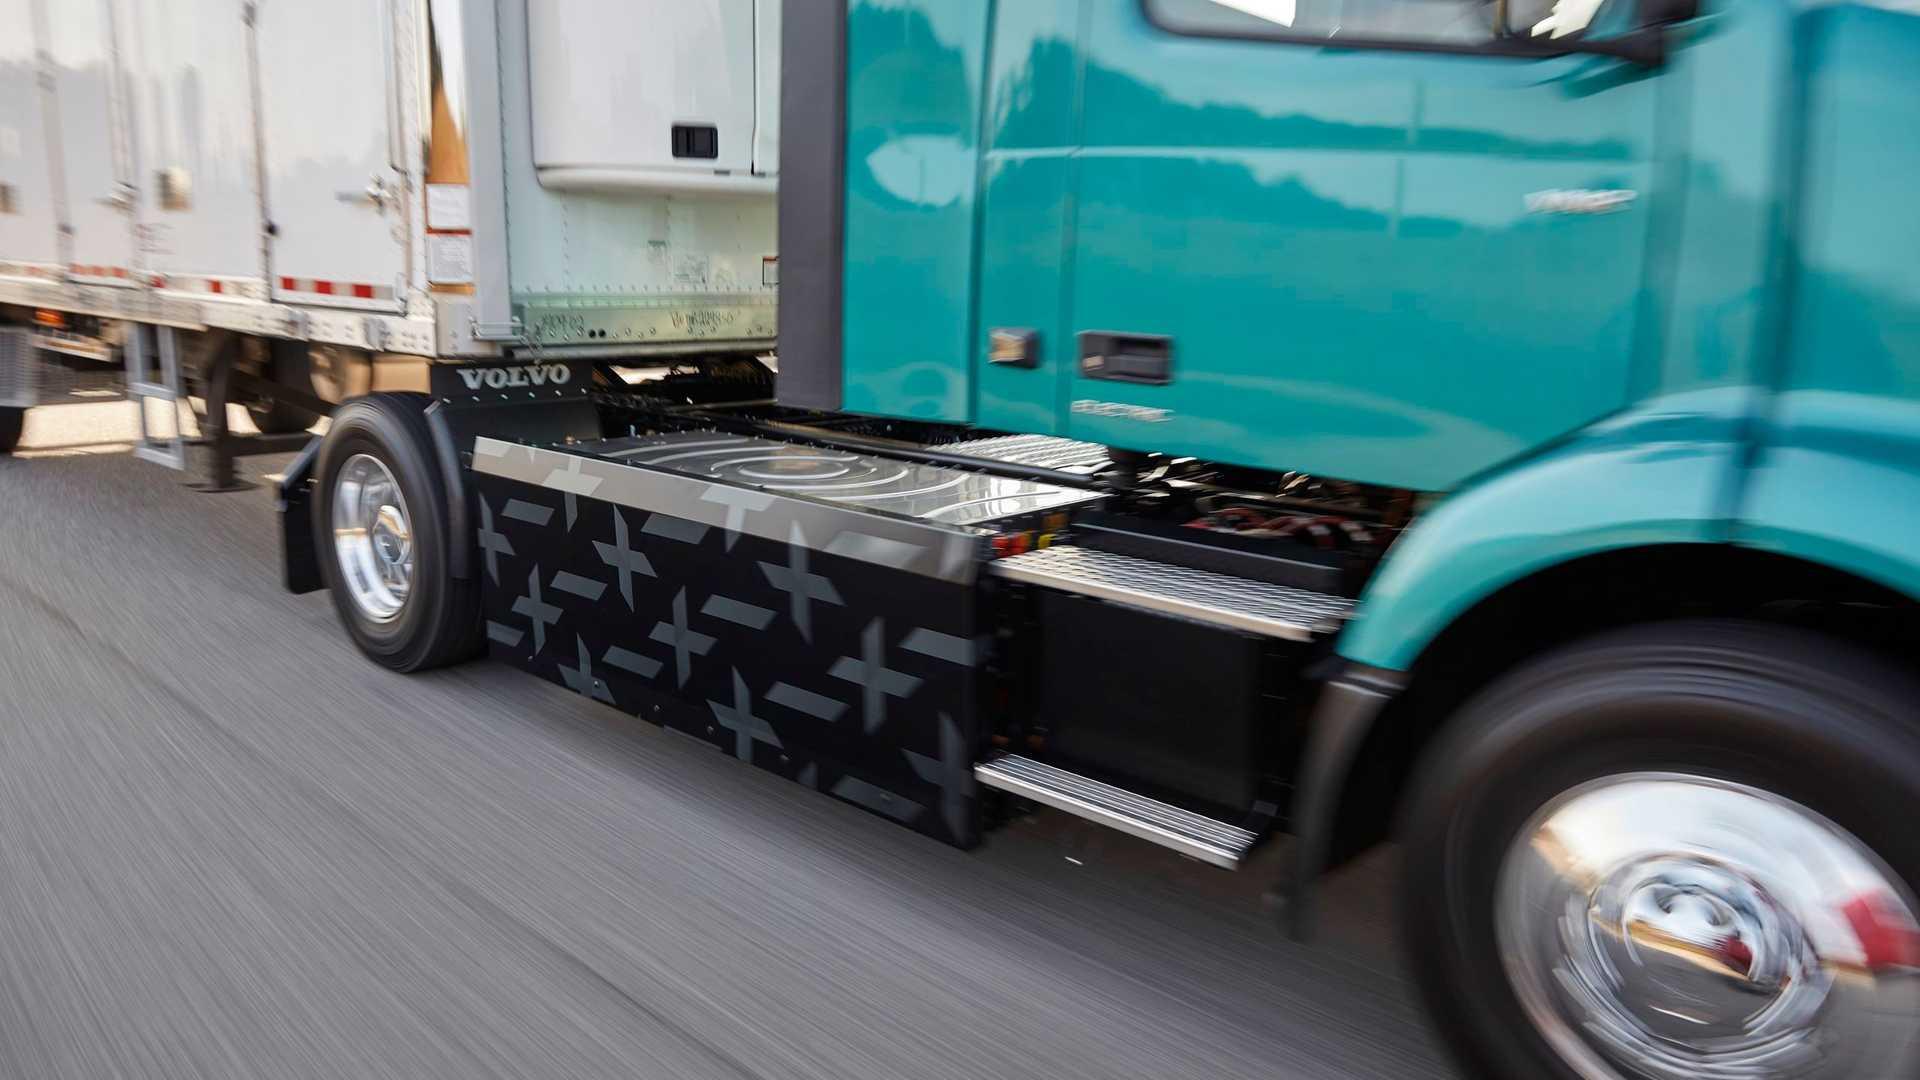 volvo vnr electric 3 اولین کامیون تمام برقی Volvo Trucks معرفی شد اخبار IT